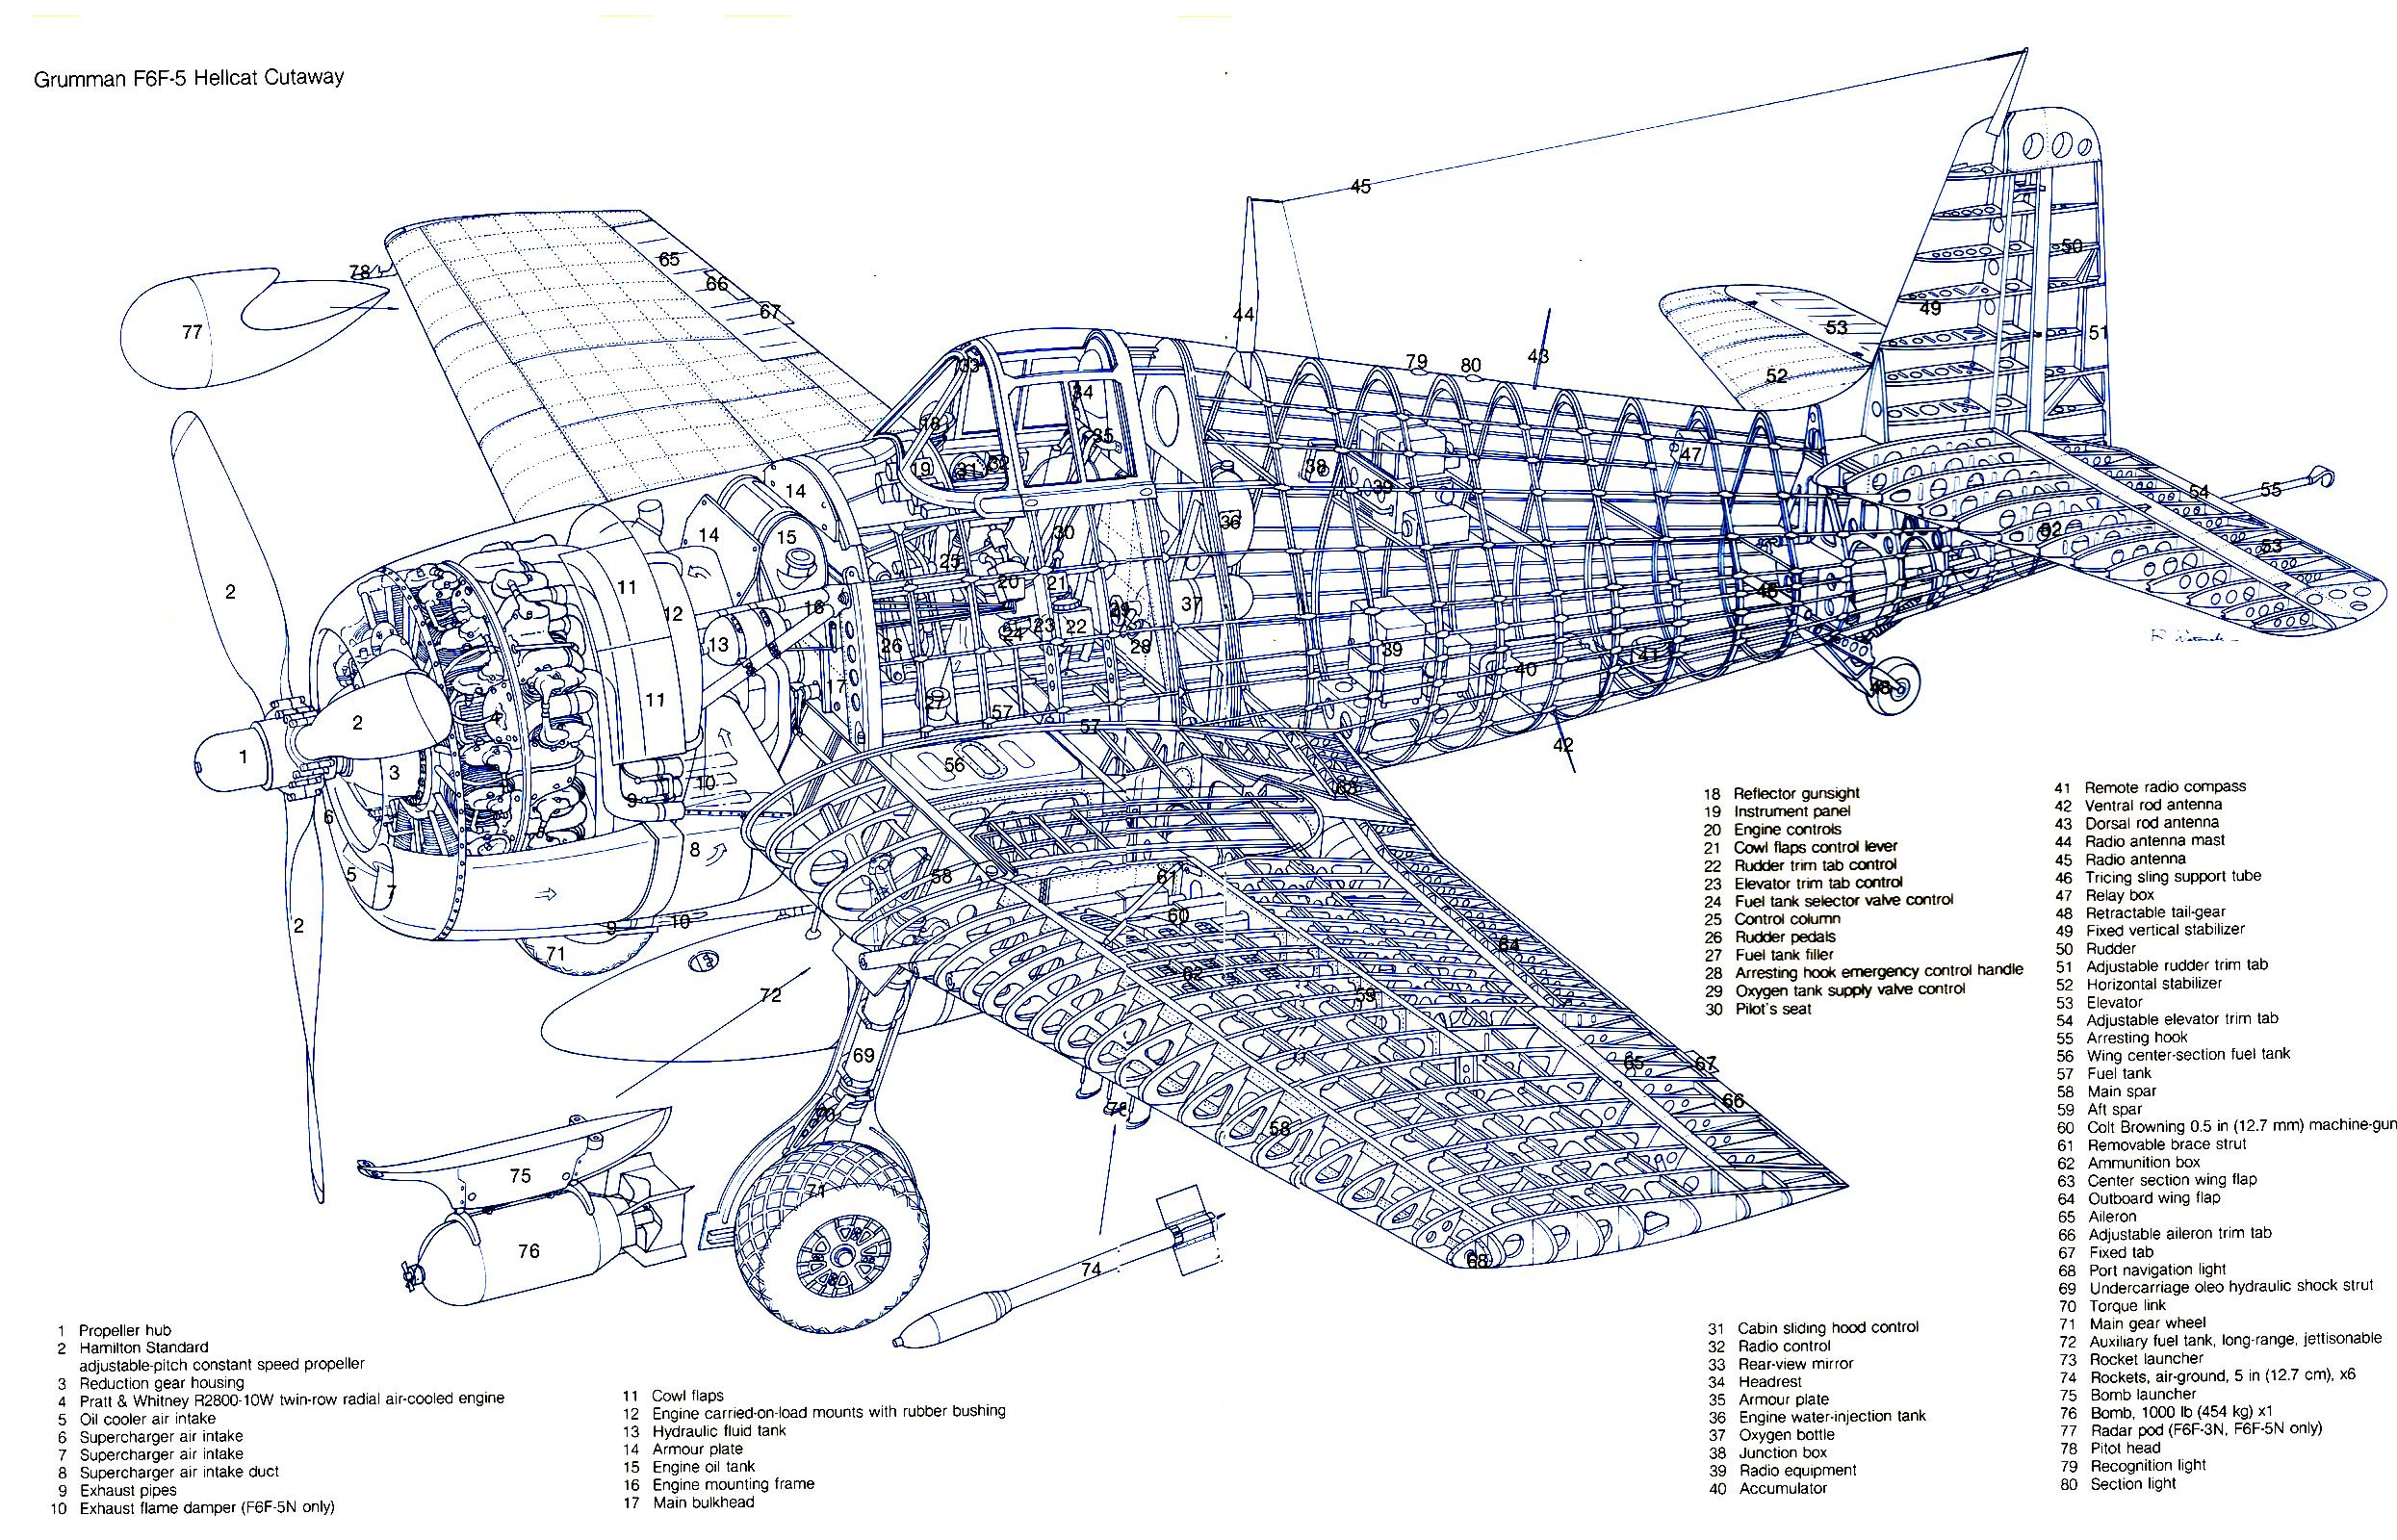 Artwork showing internal structure of a typical Grumman F6F 5 Hellcat 0A